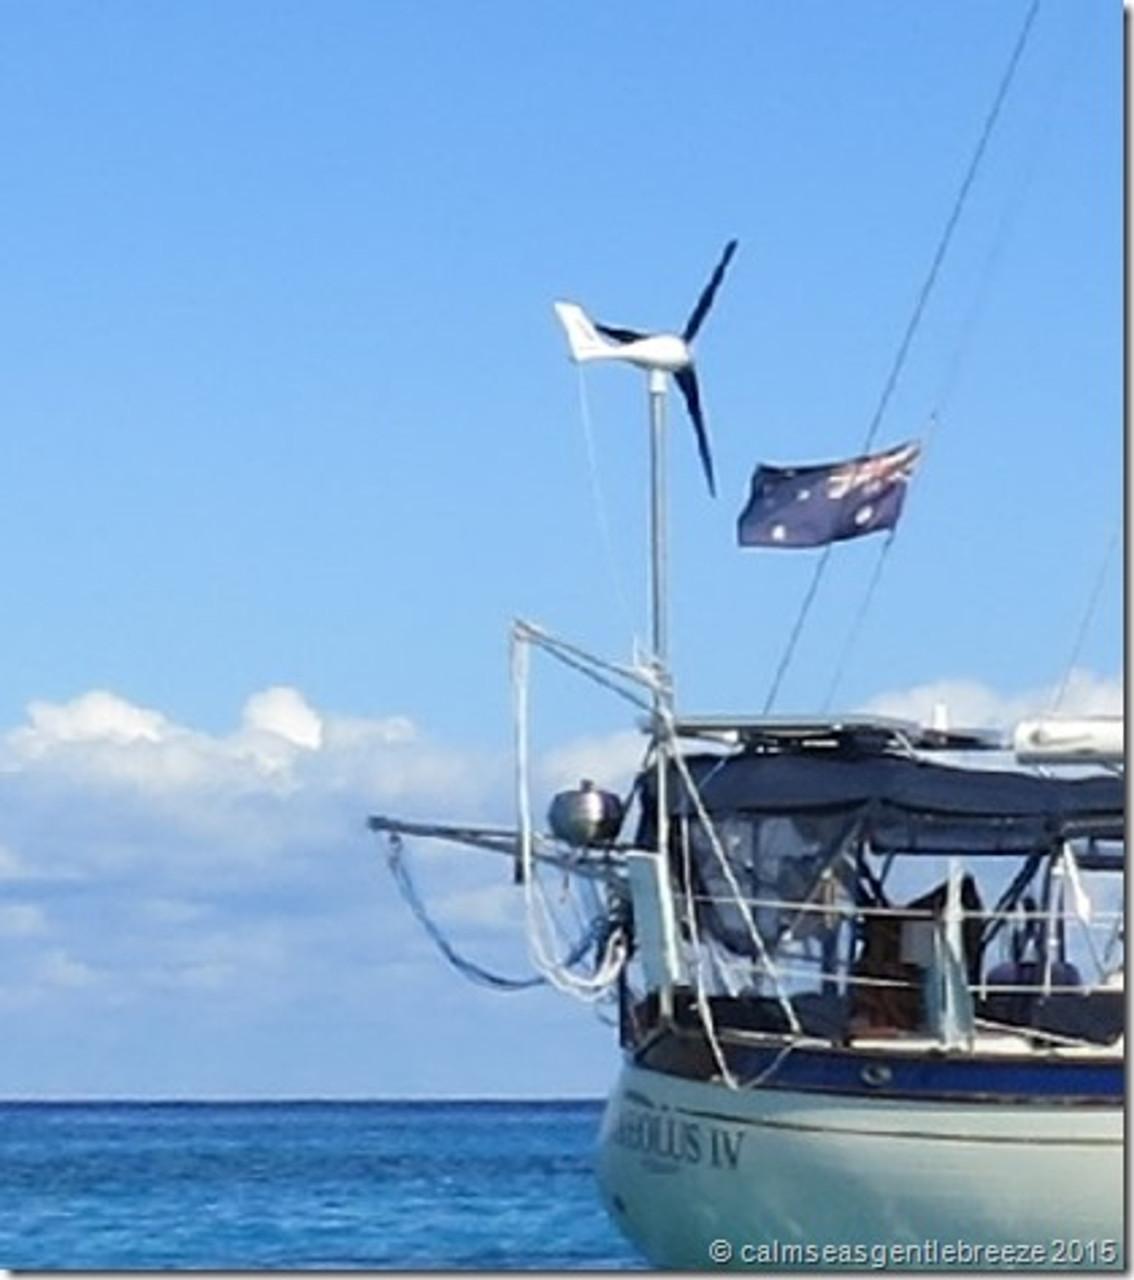 Marine Kinetix MK4+ Wind Generator mounted on double-ender sailboat - Compliments of Kate & Chris Ellis on Aeolus IV